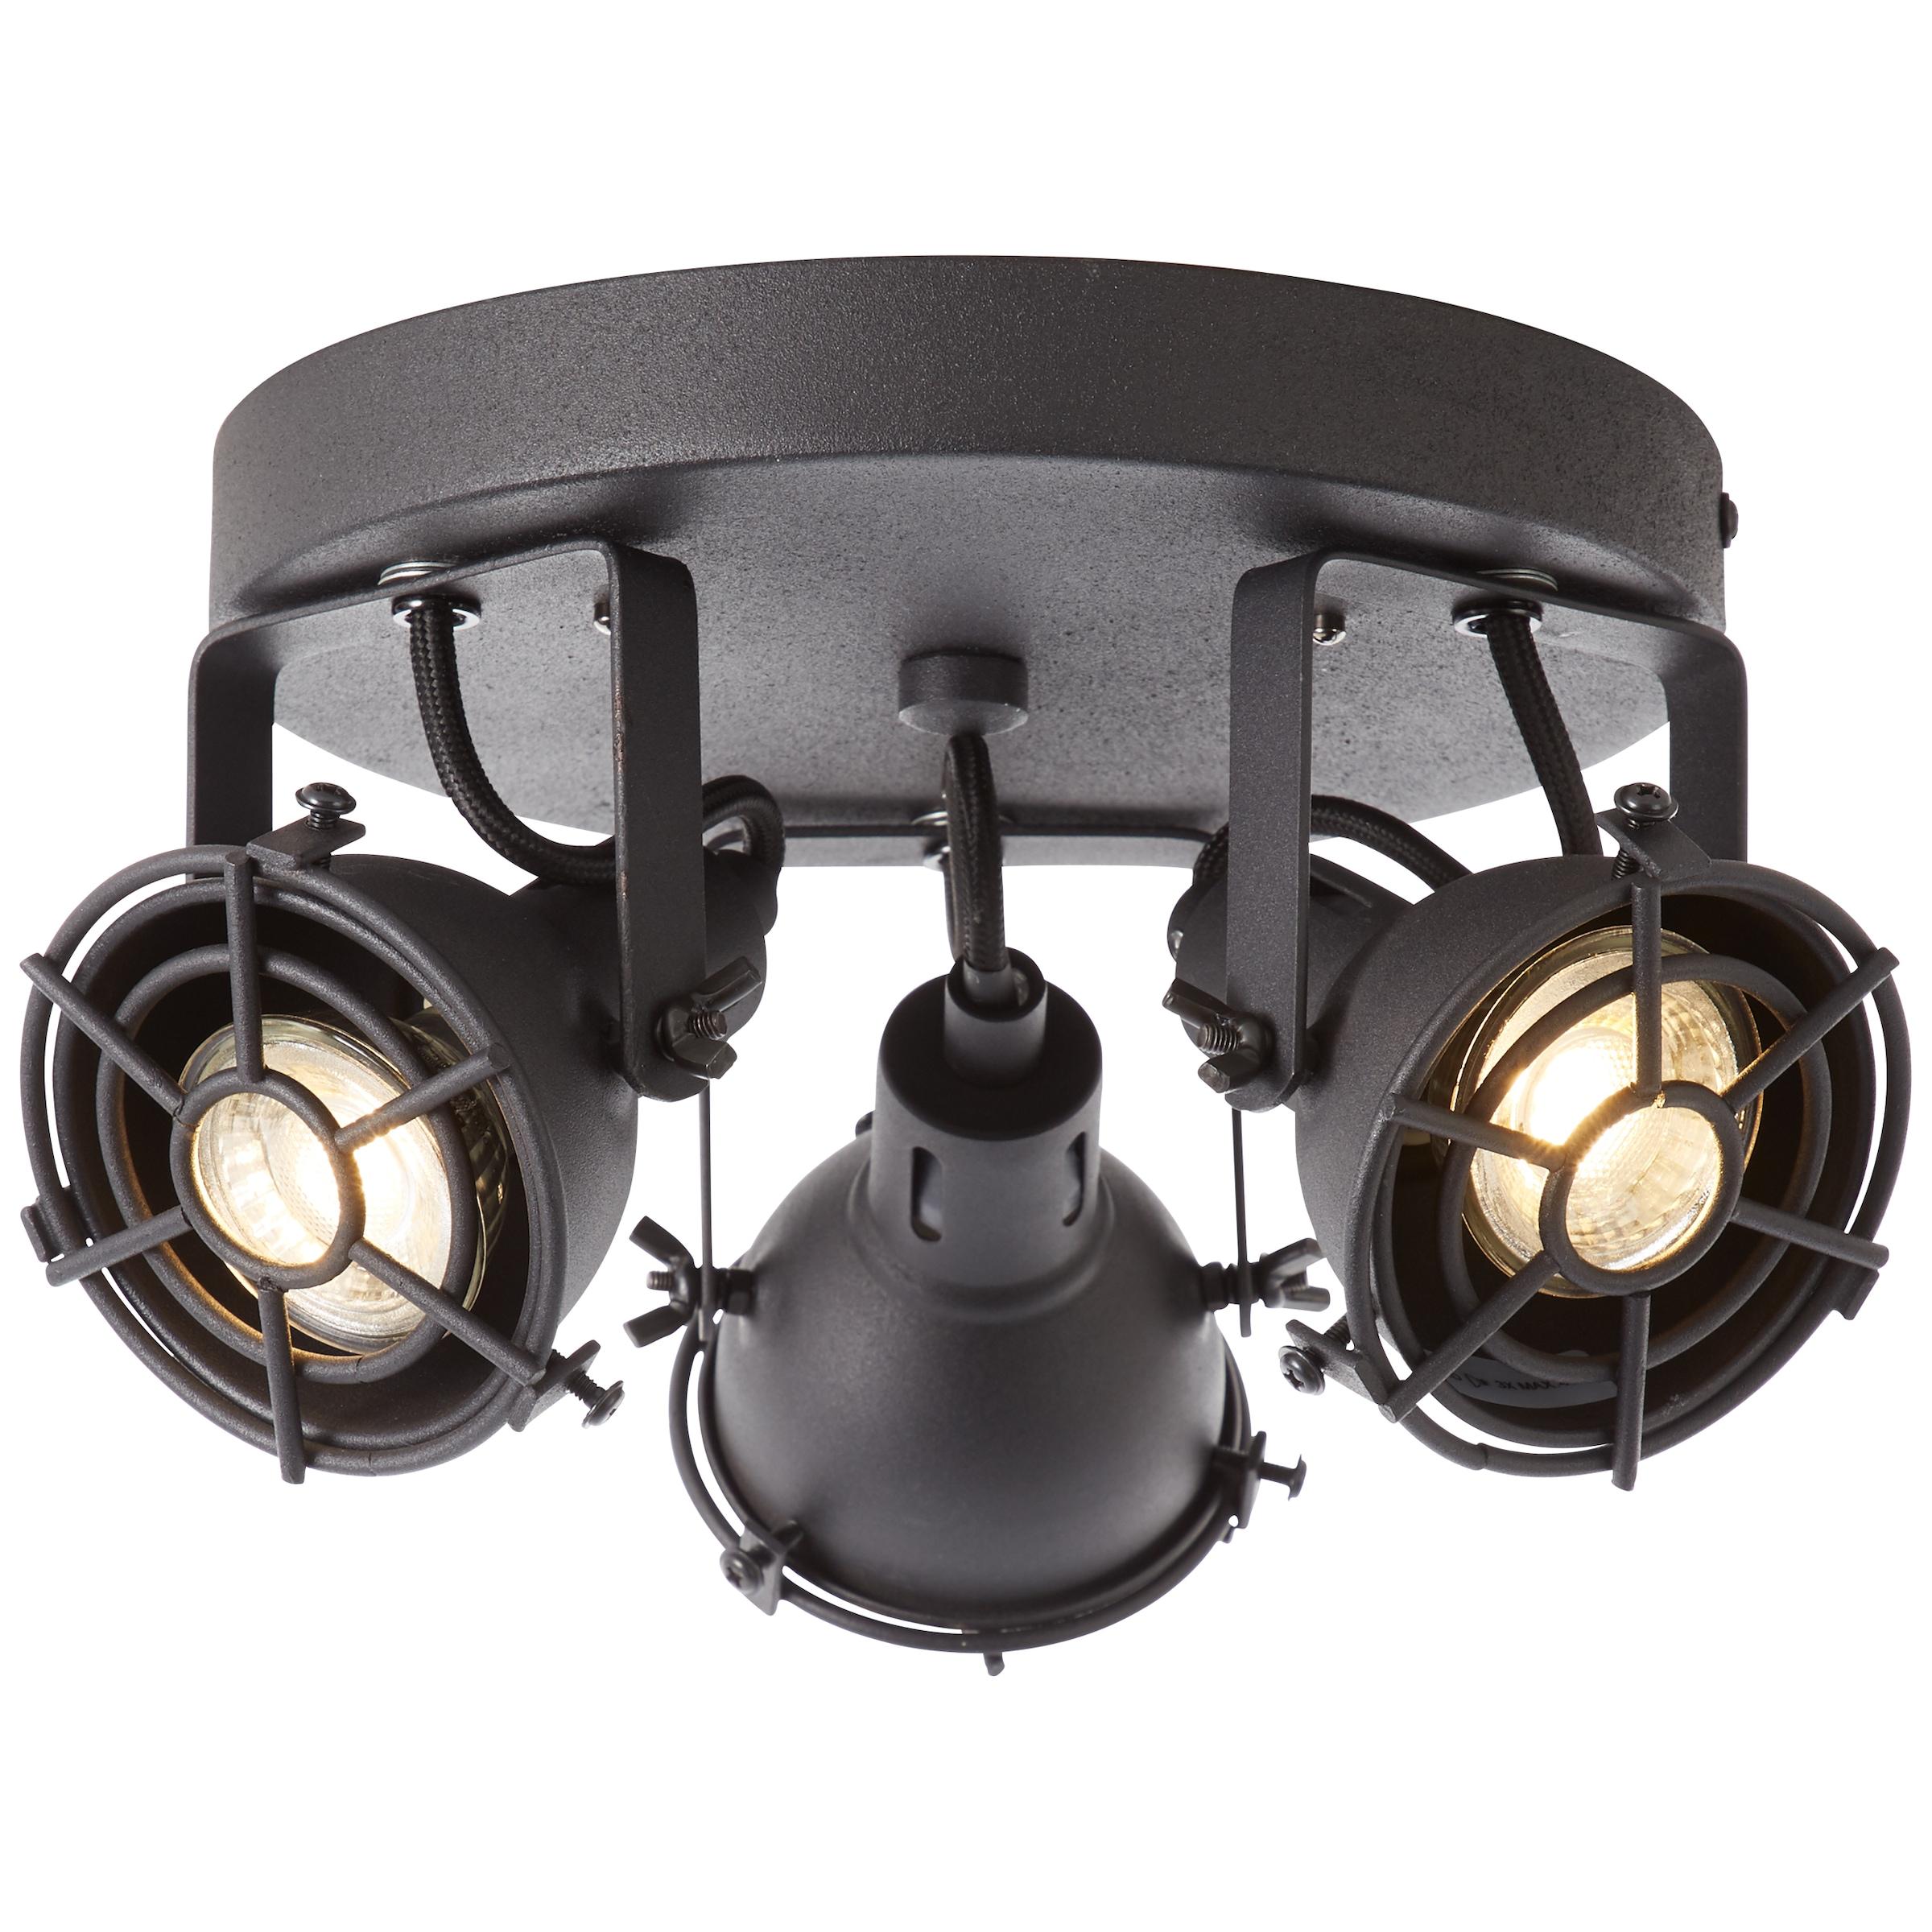 Brilliant Leuchten Jesper LED Spotrohr 4flg schwarz korund